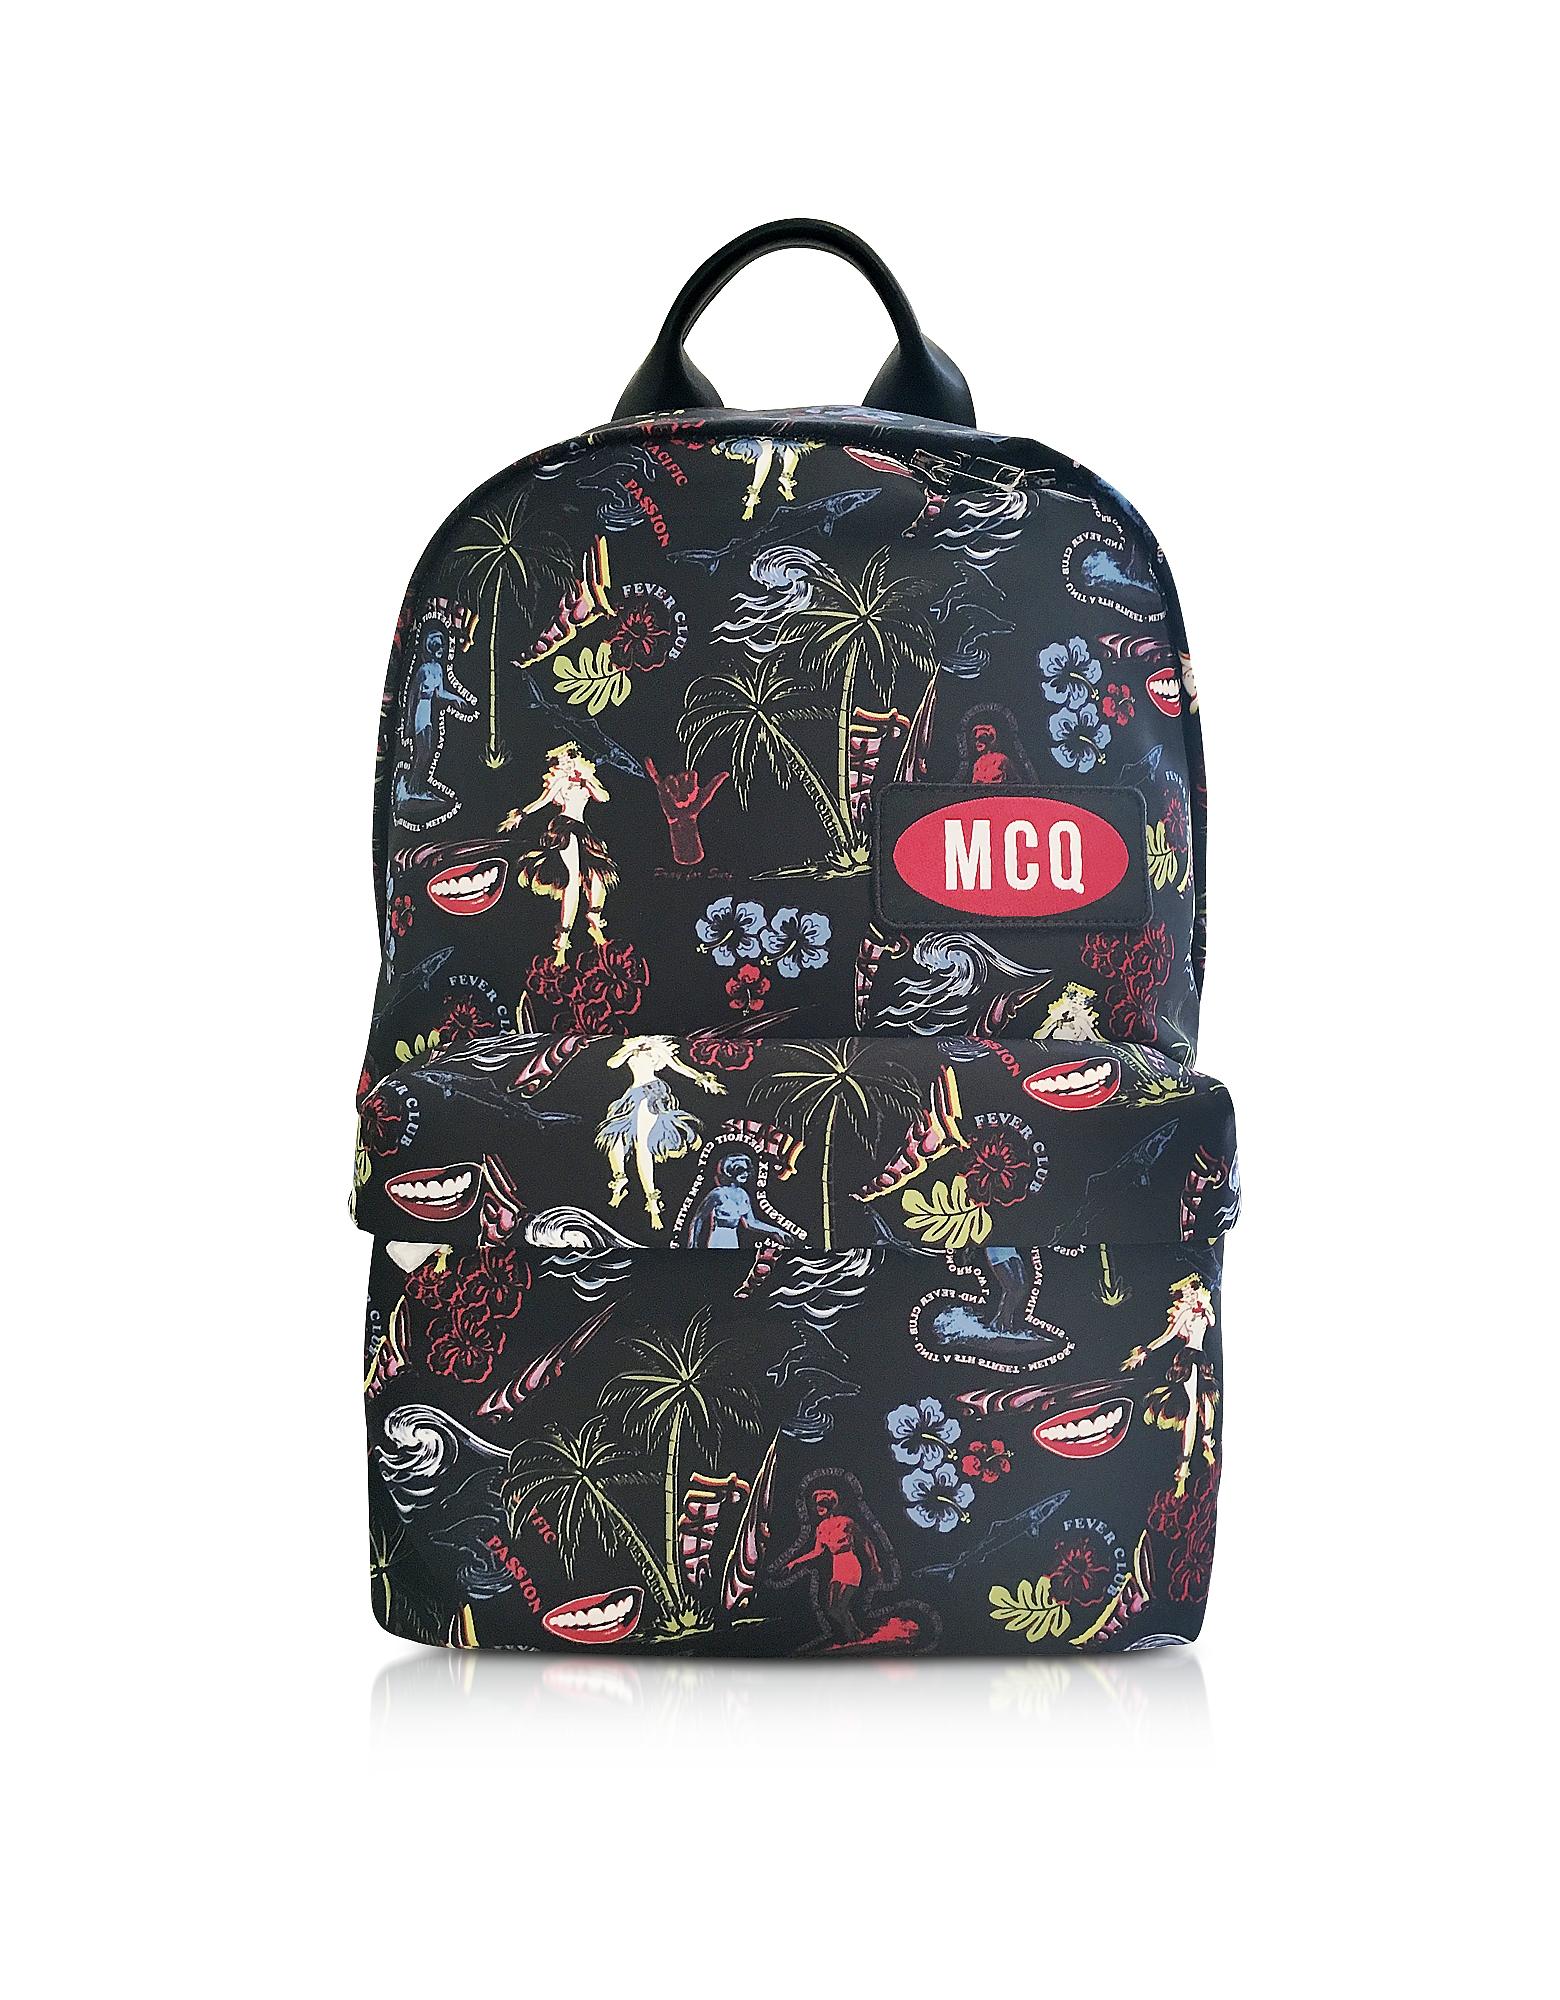 McQ Alexander McQueen Backpacks, Darkest Black Printed Nylon Classic Backpack